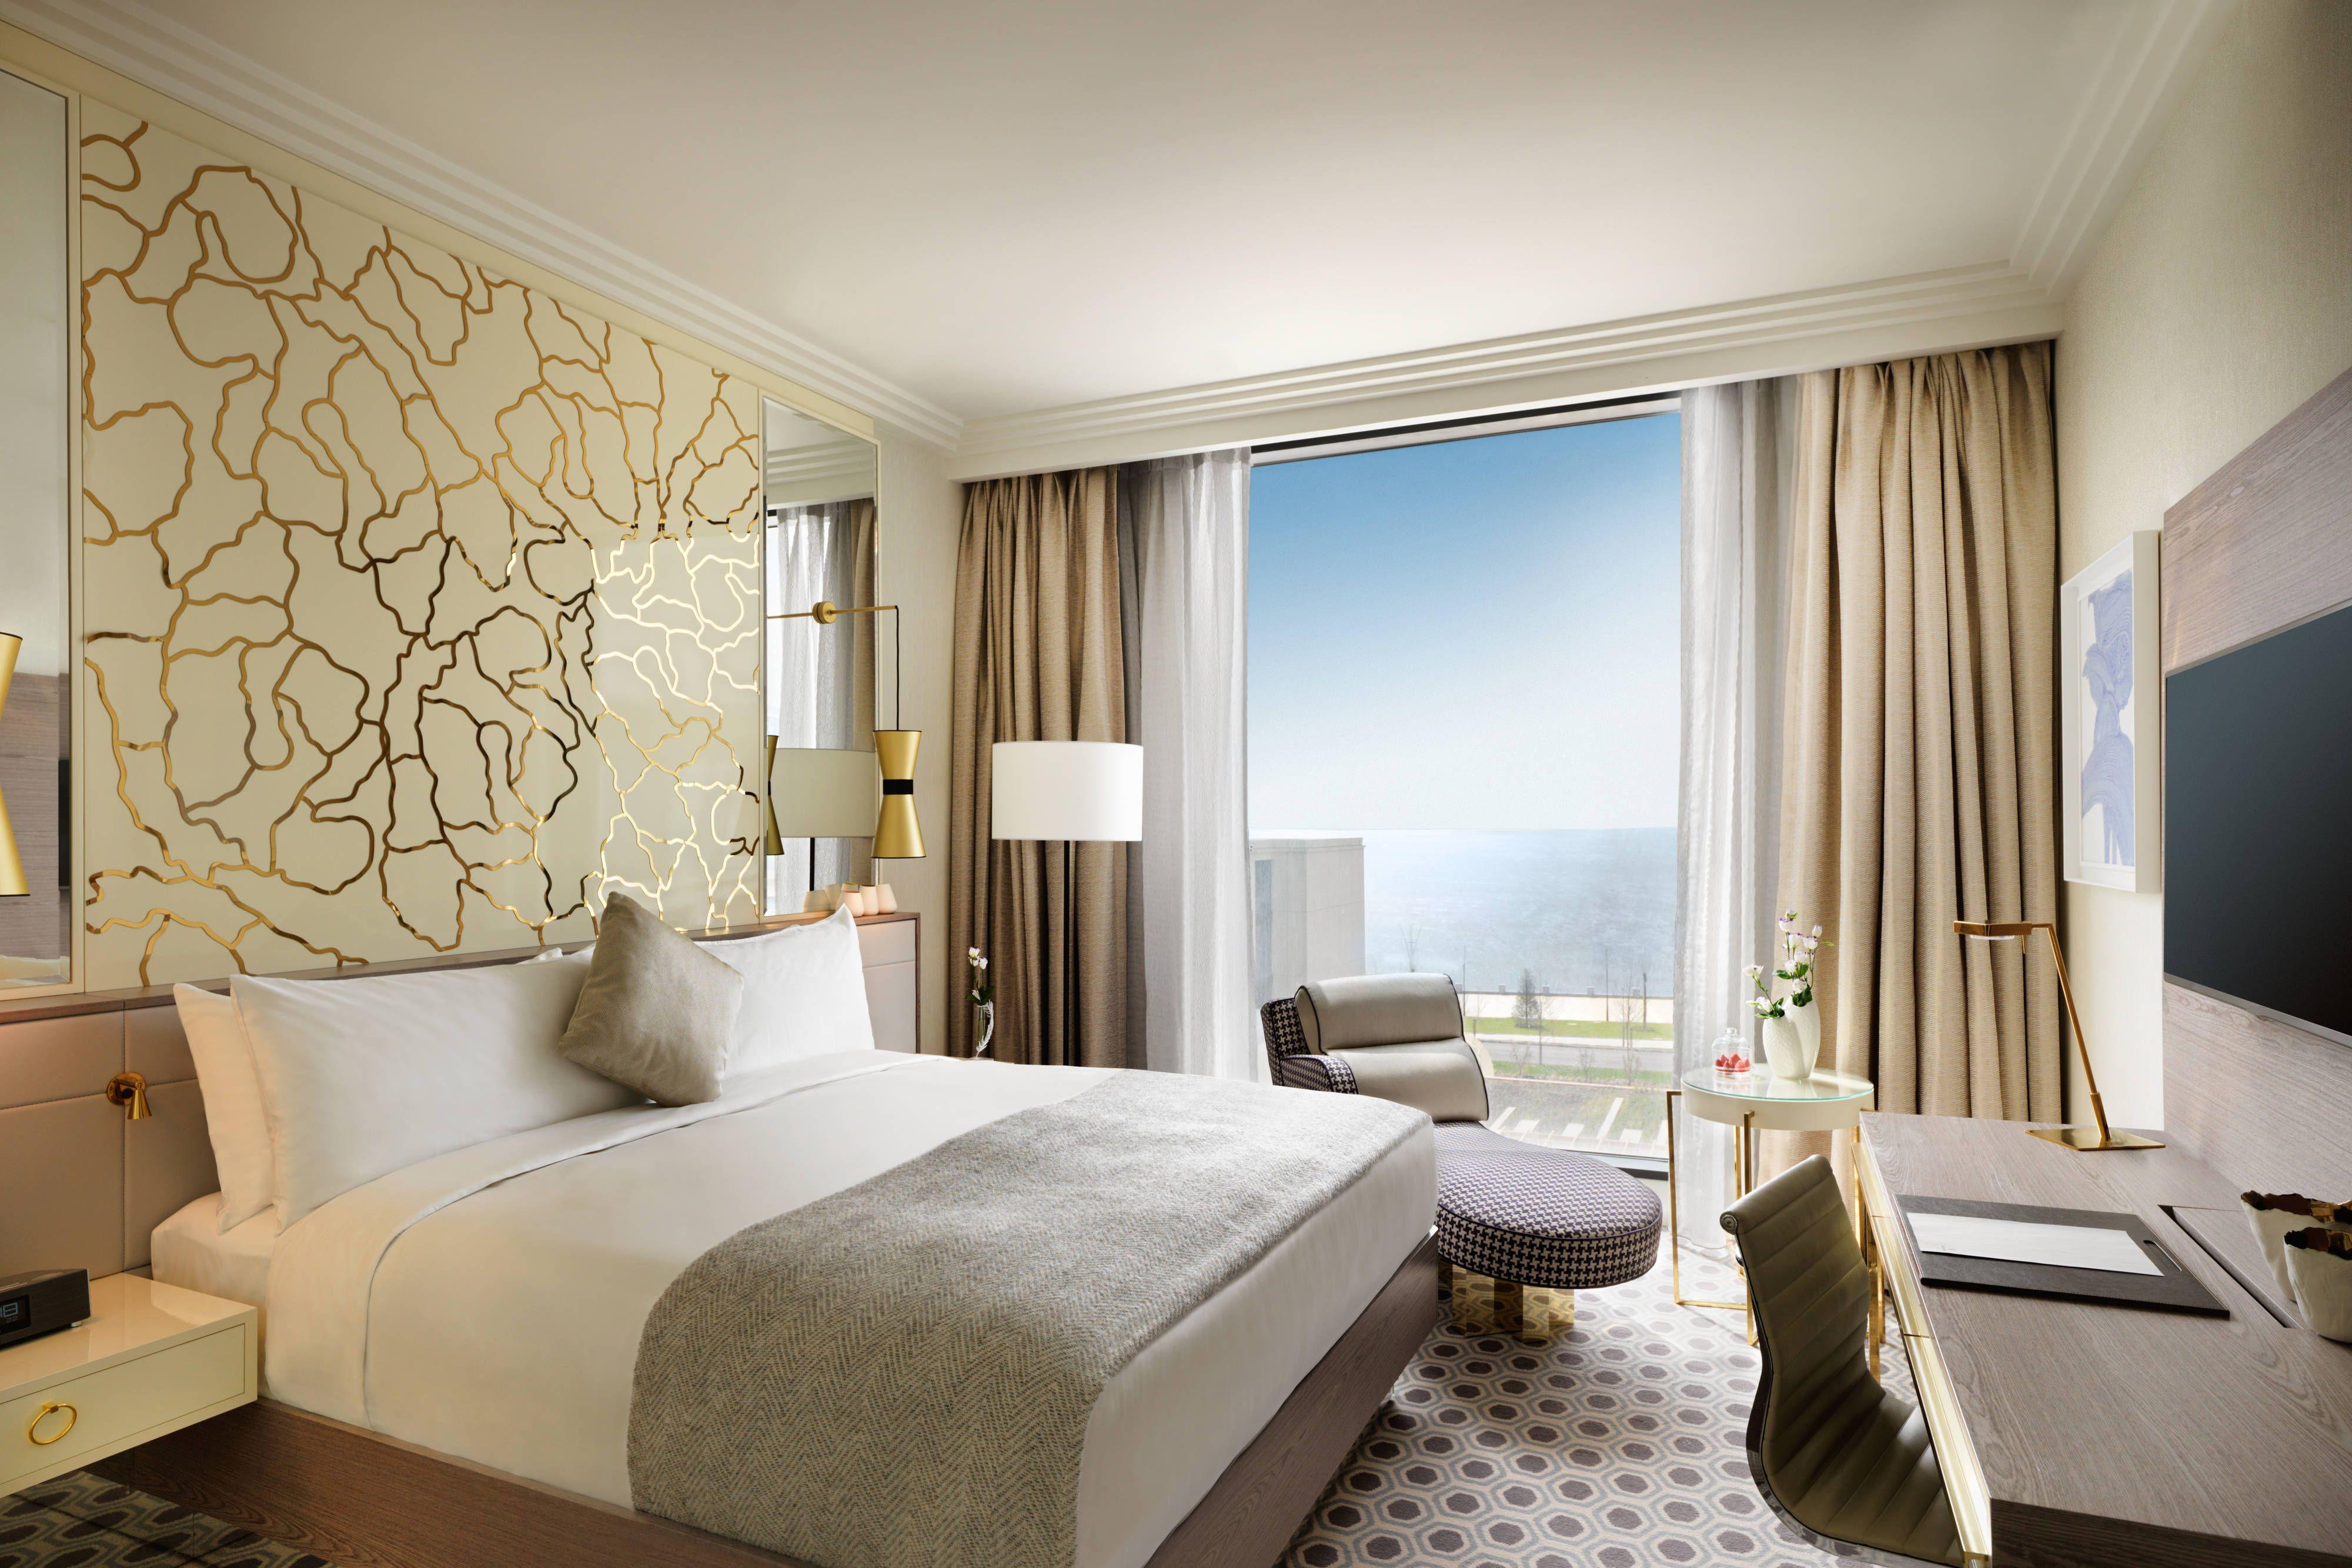 Boulevard Hotel Baku Autograph Collection Sea View King Guest Room Holiday Travel Happy Boulevard Hotel Hotel Baku